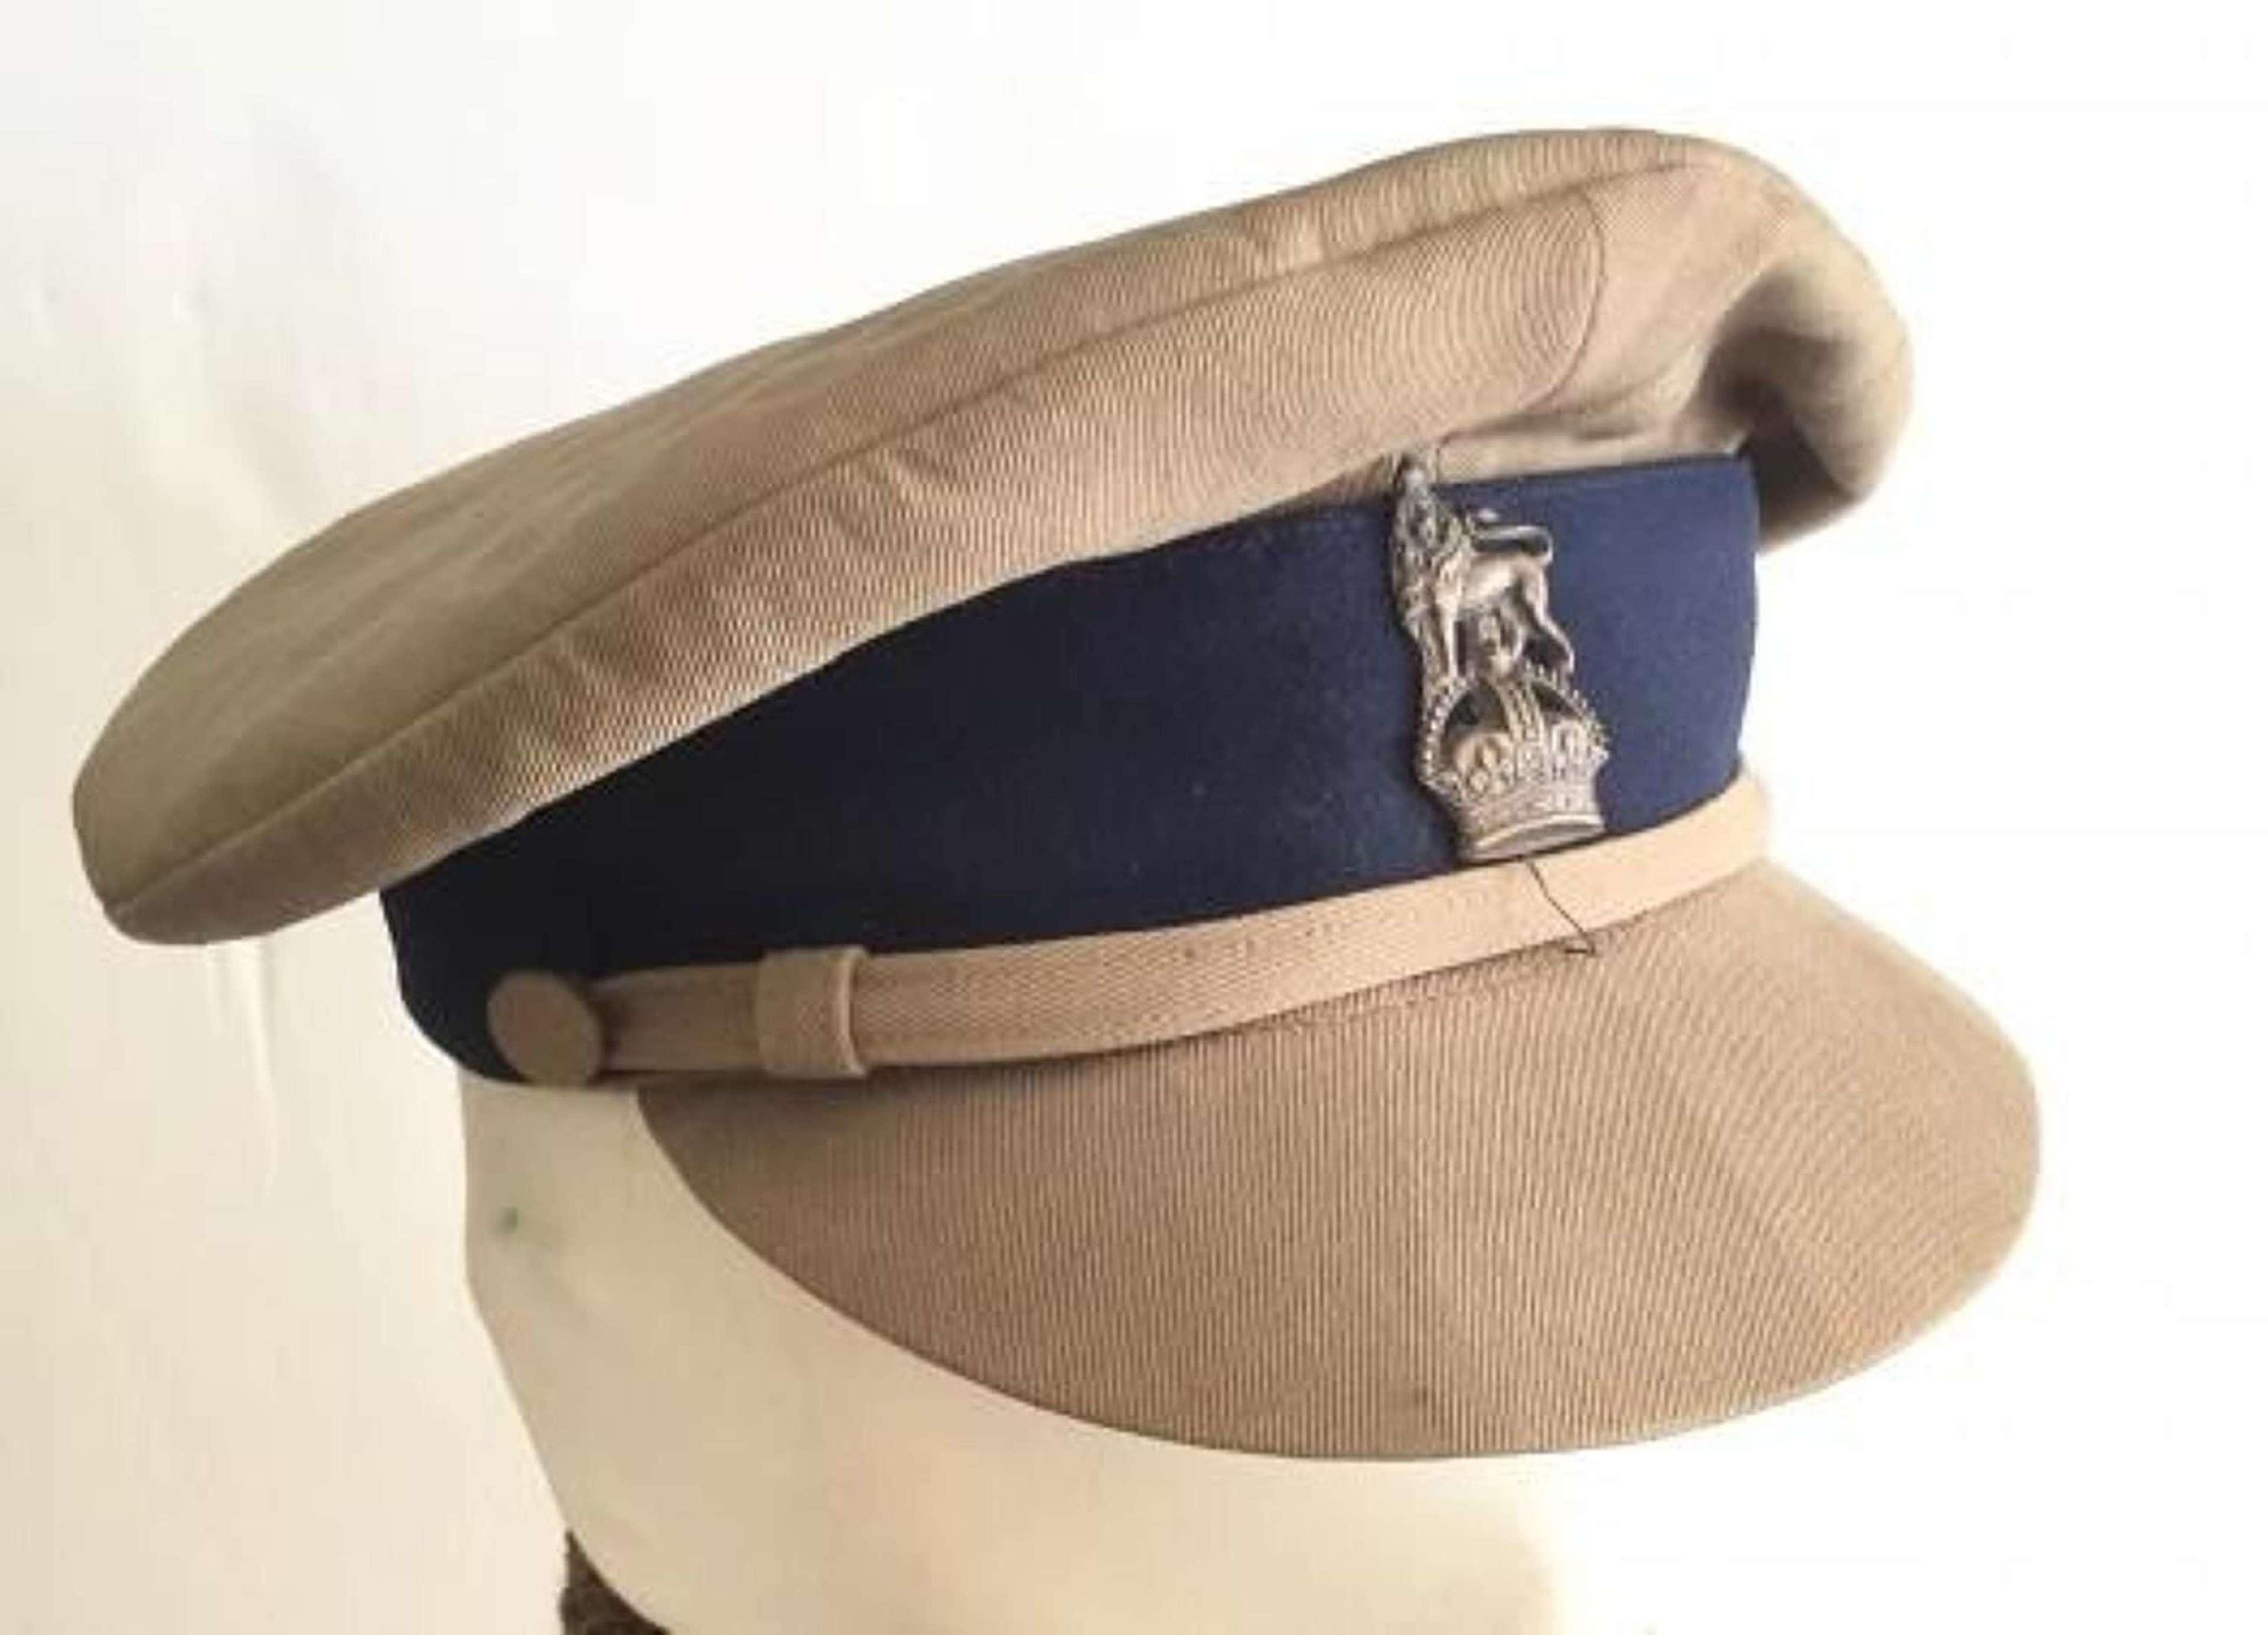 WW1 Middle East Ordnance Staff Officer Cap.